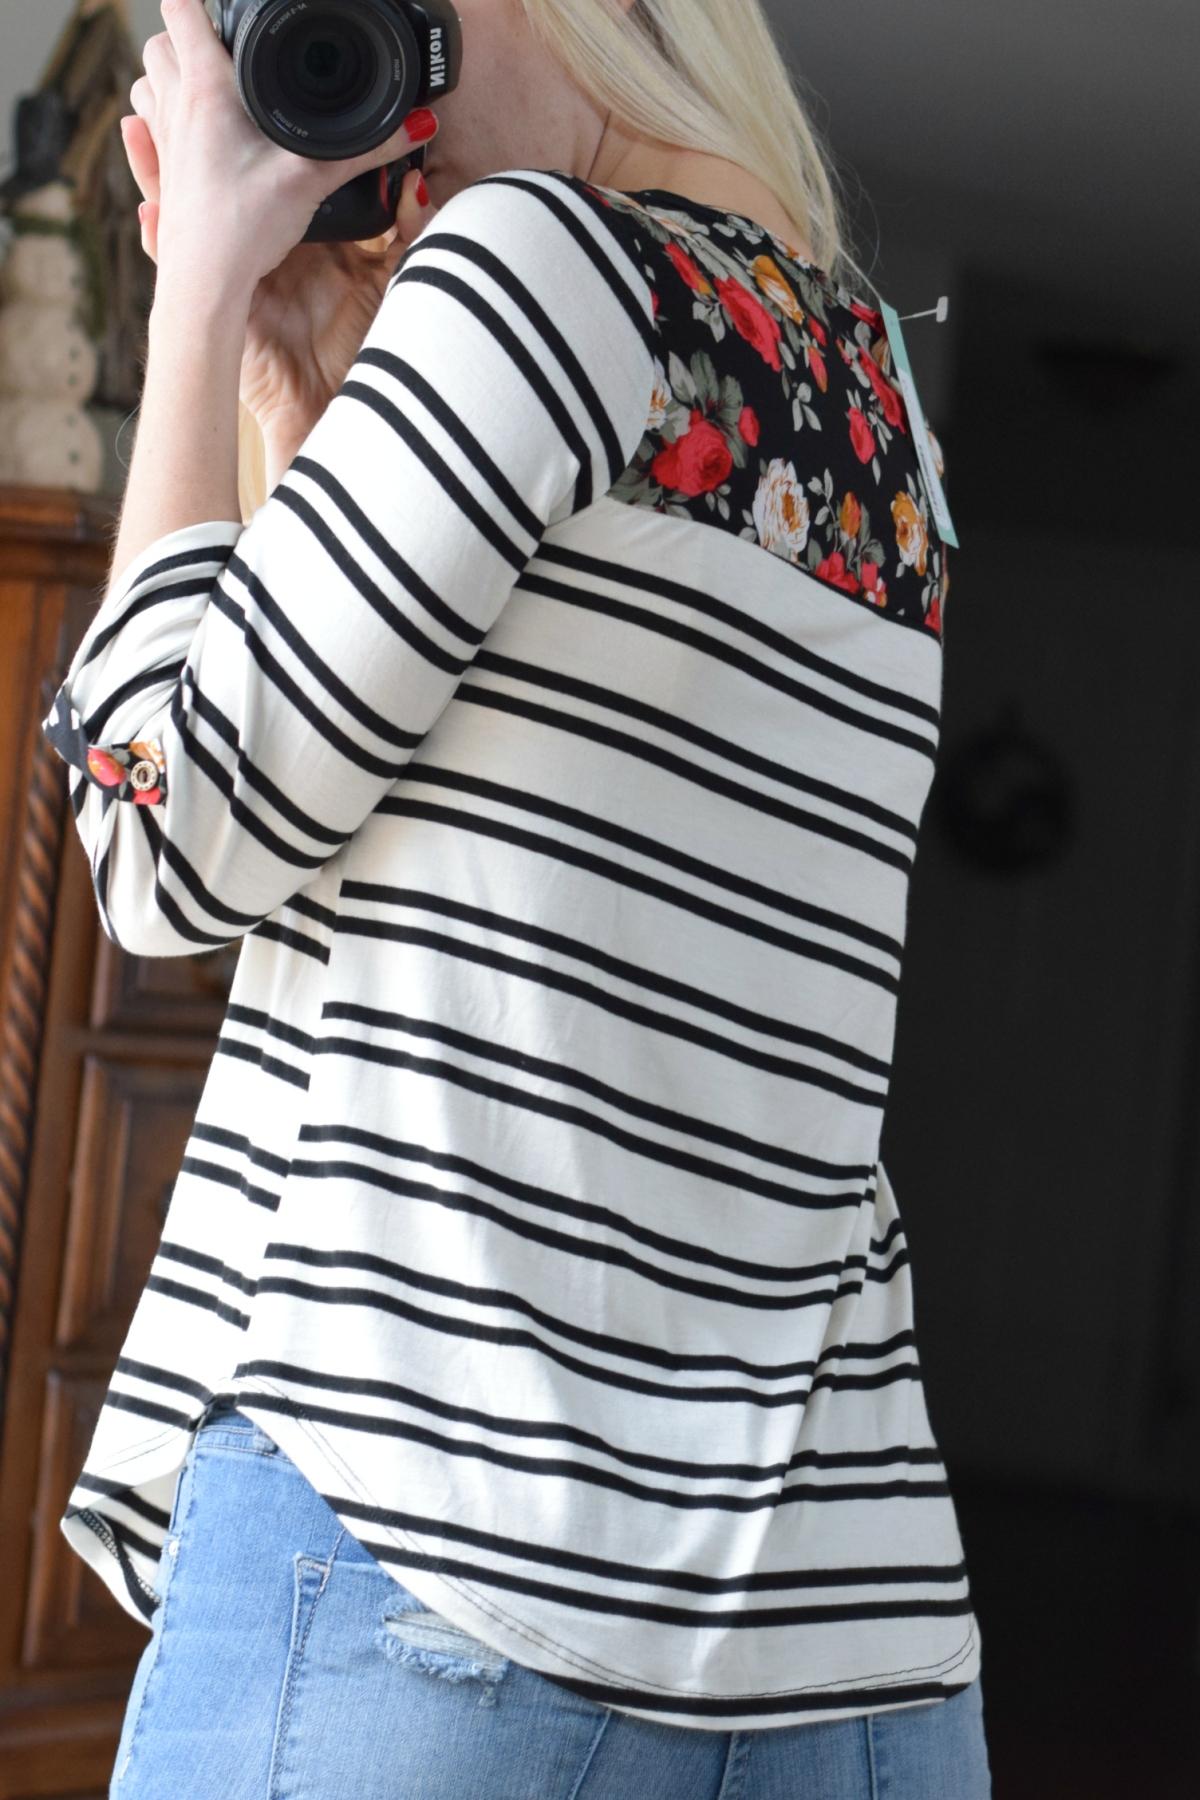 December 2015 Stitch Fix Review: Le Lis Sutherlin Contrast Print Knit Top |www.pearlsandsportsbras.com|